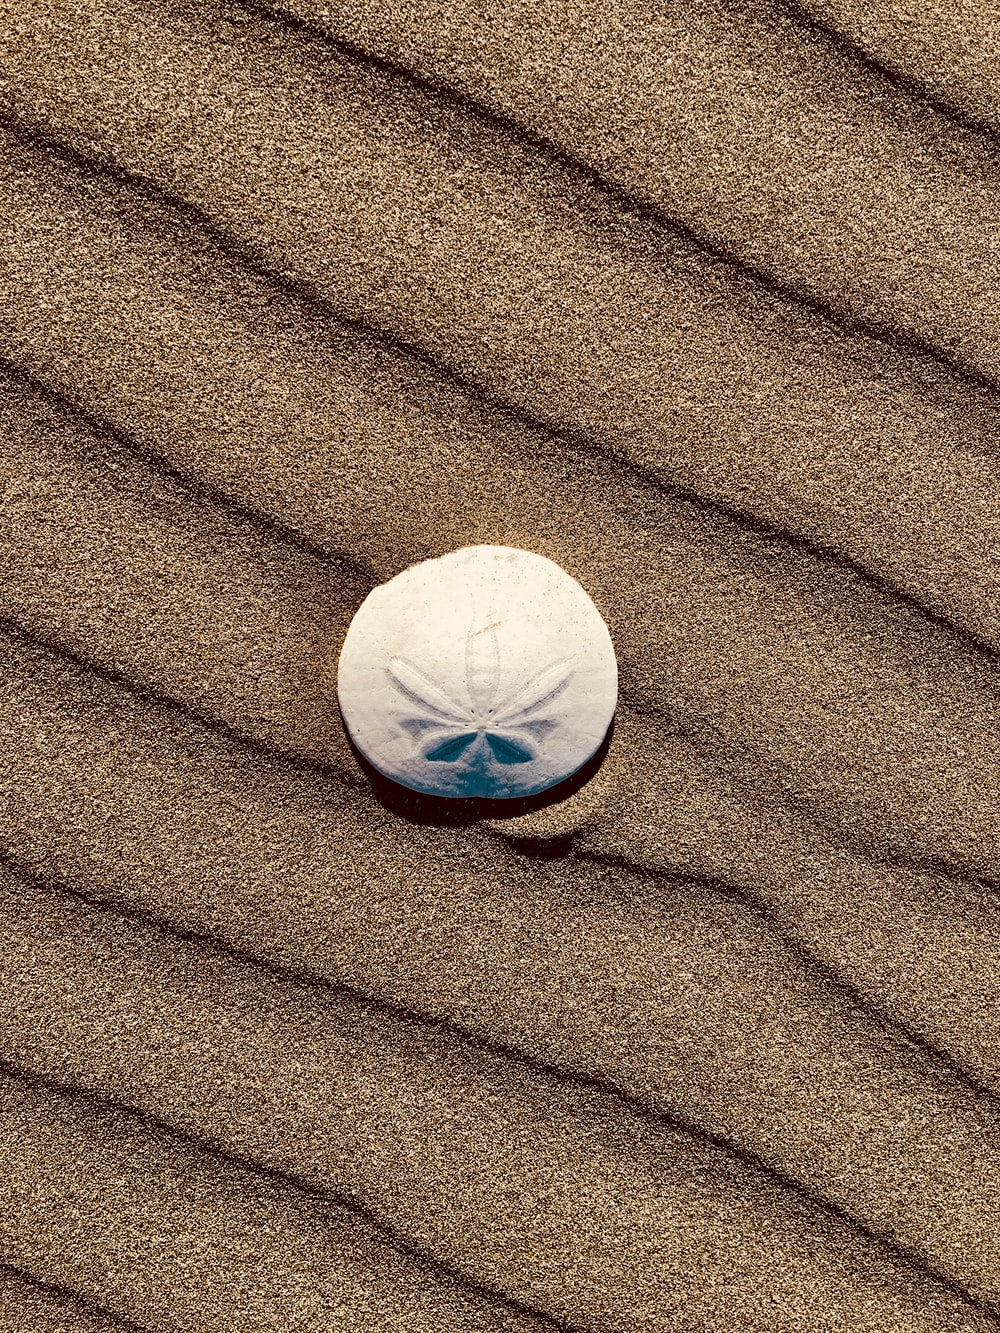 sand dollar on sand